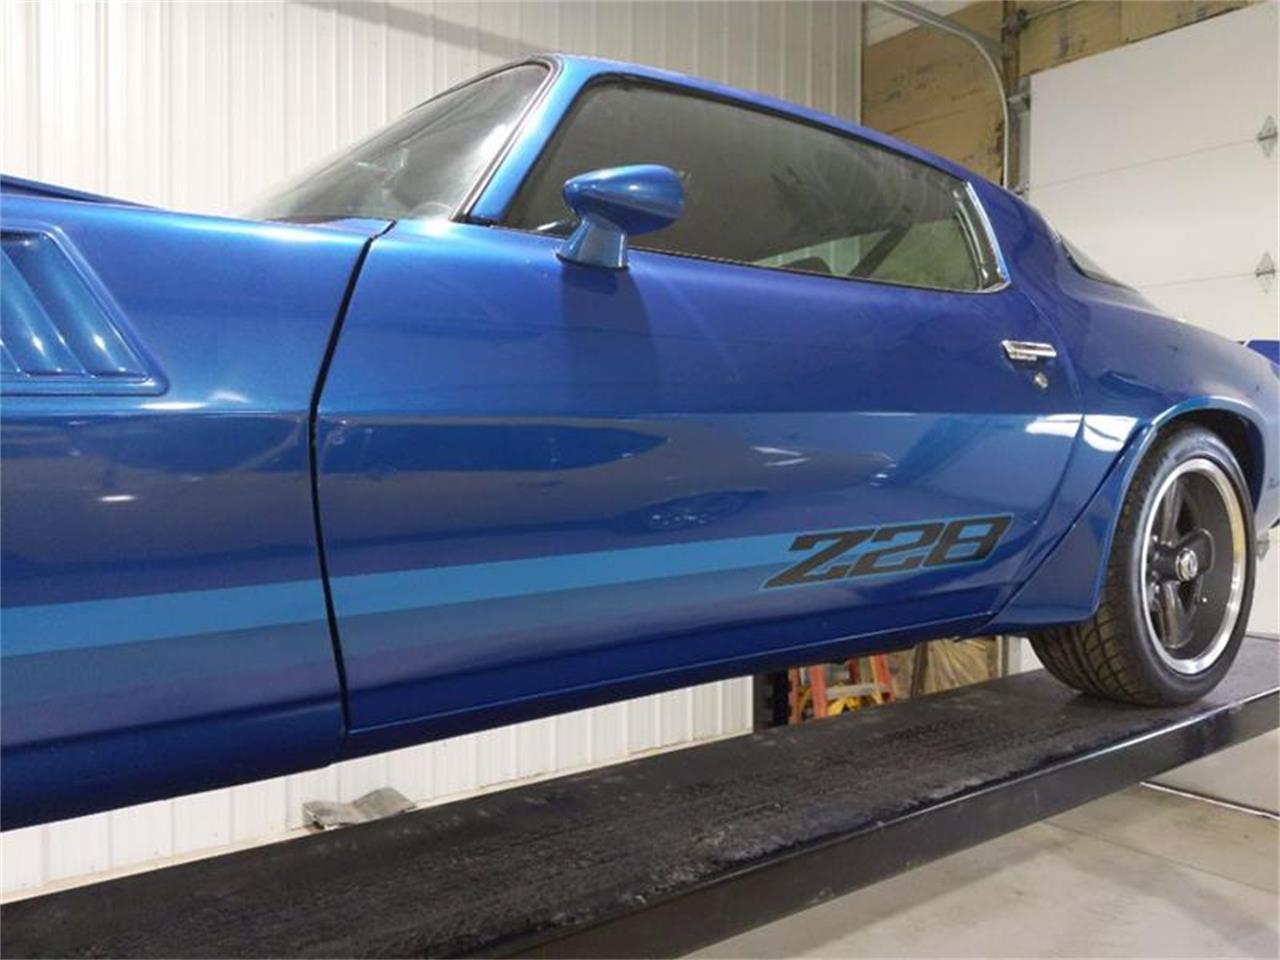 Large Picture of '78 Camaro located in Spirit Lake Iowa - $20,995.00 - PX97